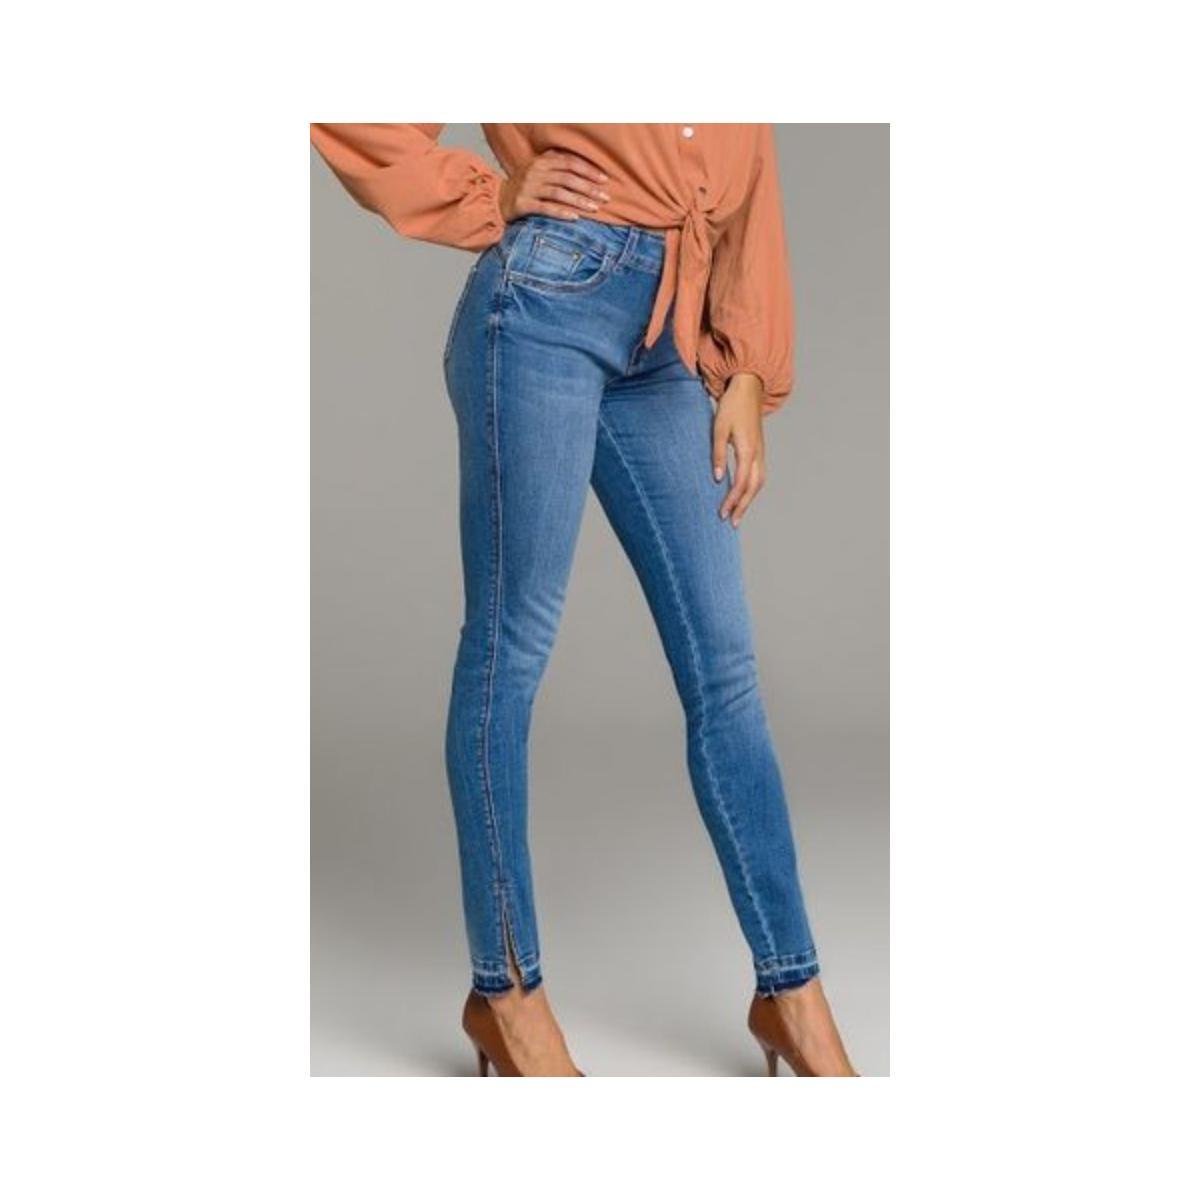 Calça Feminina Index 01.01.005152 Jeans